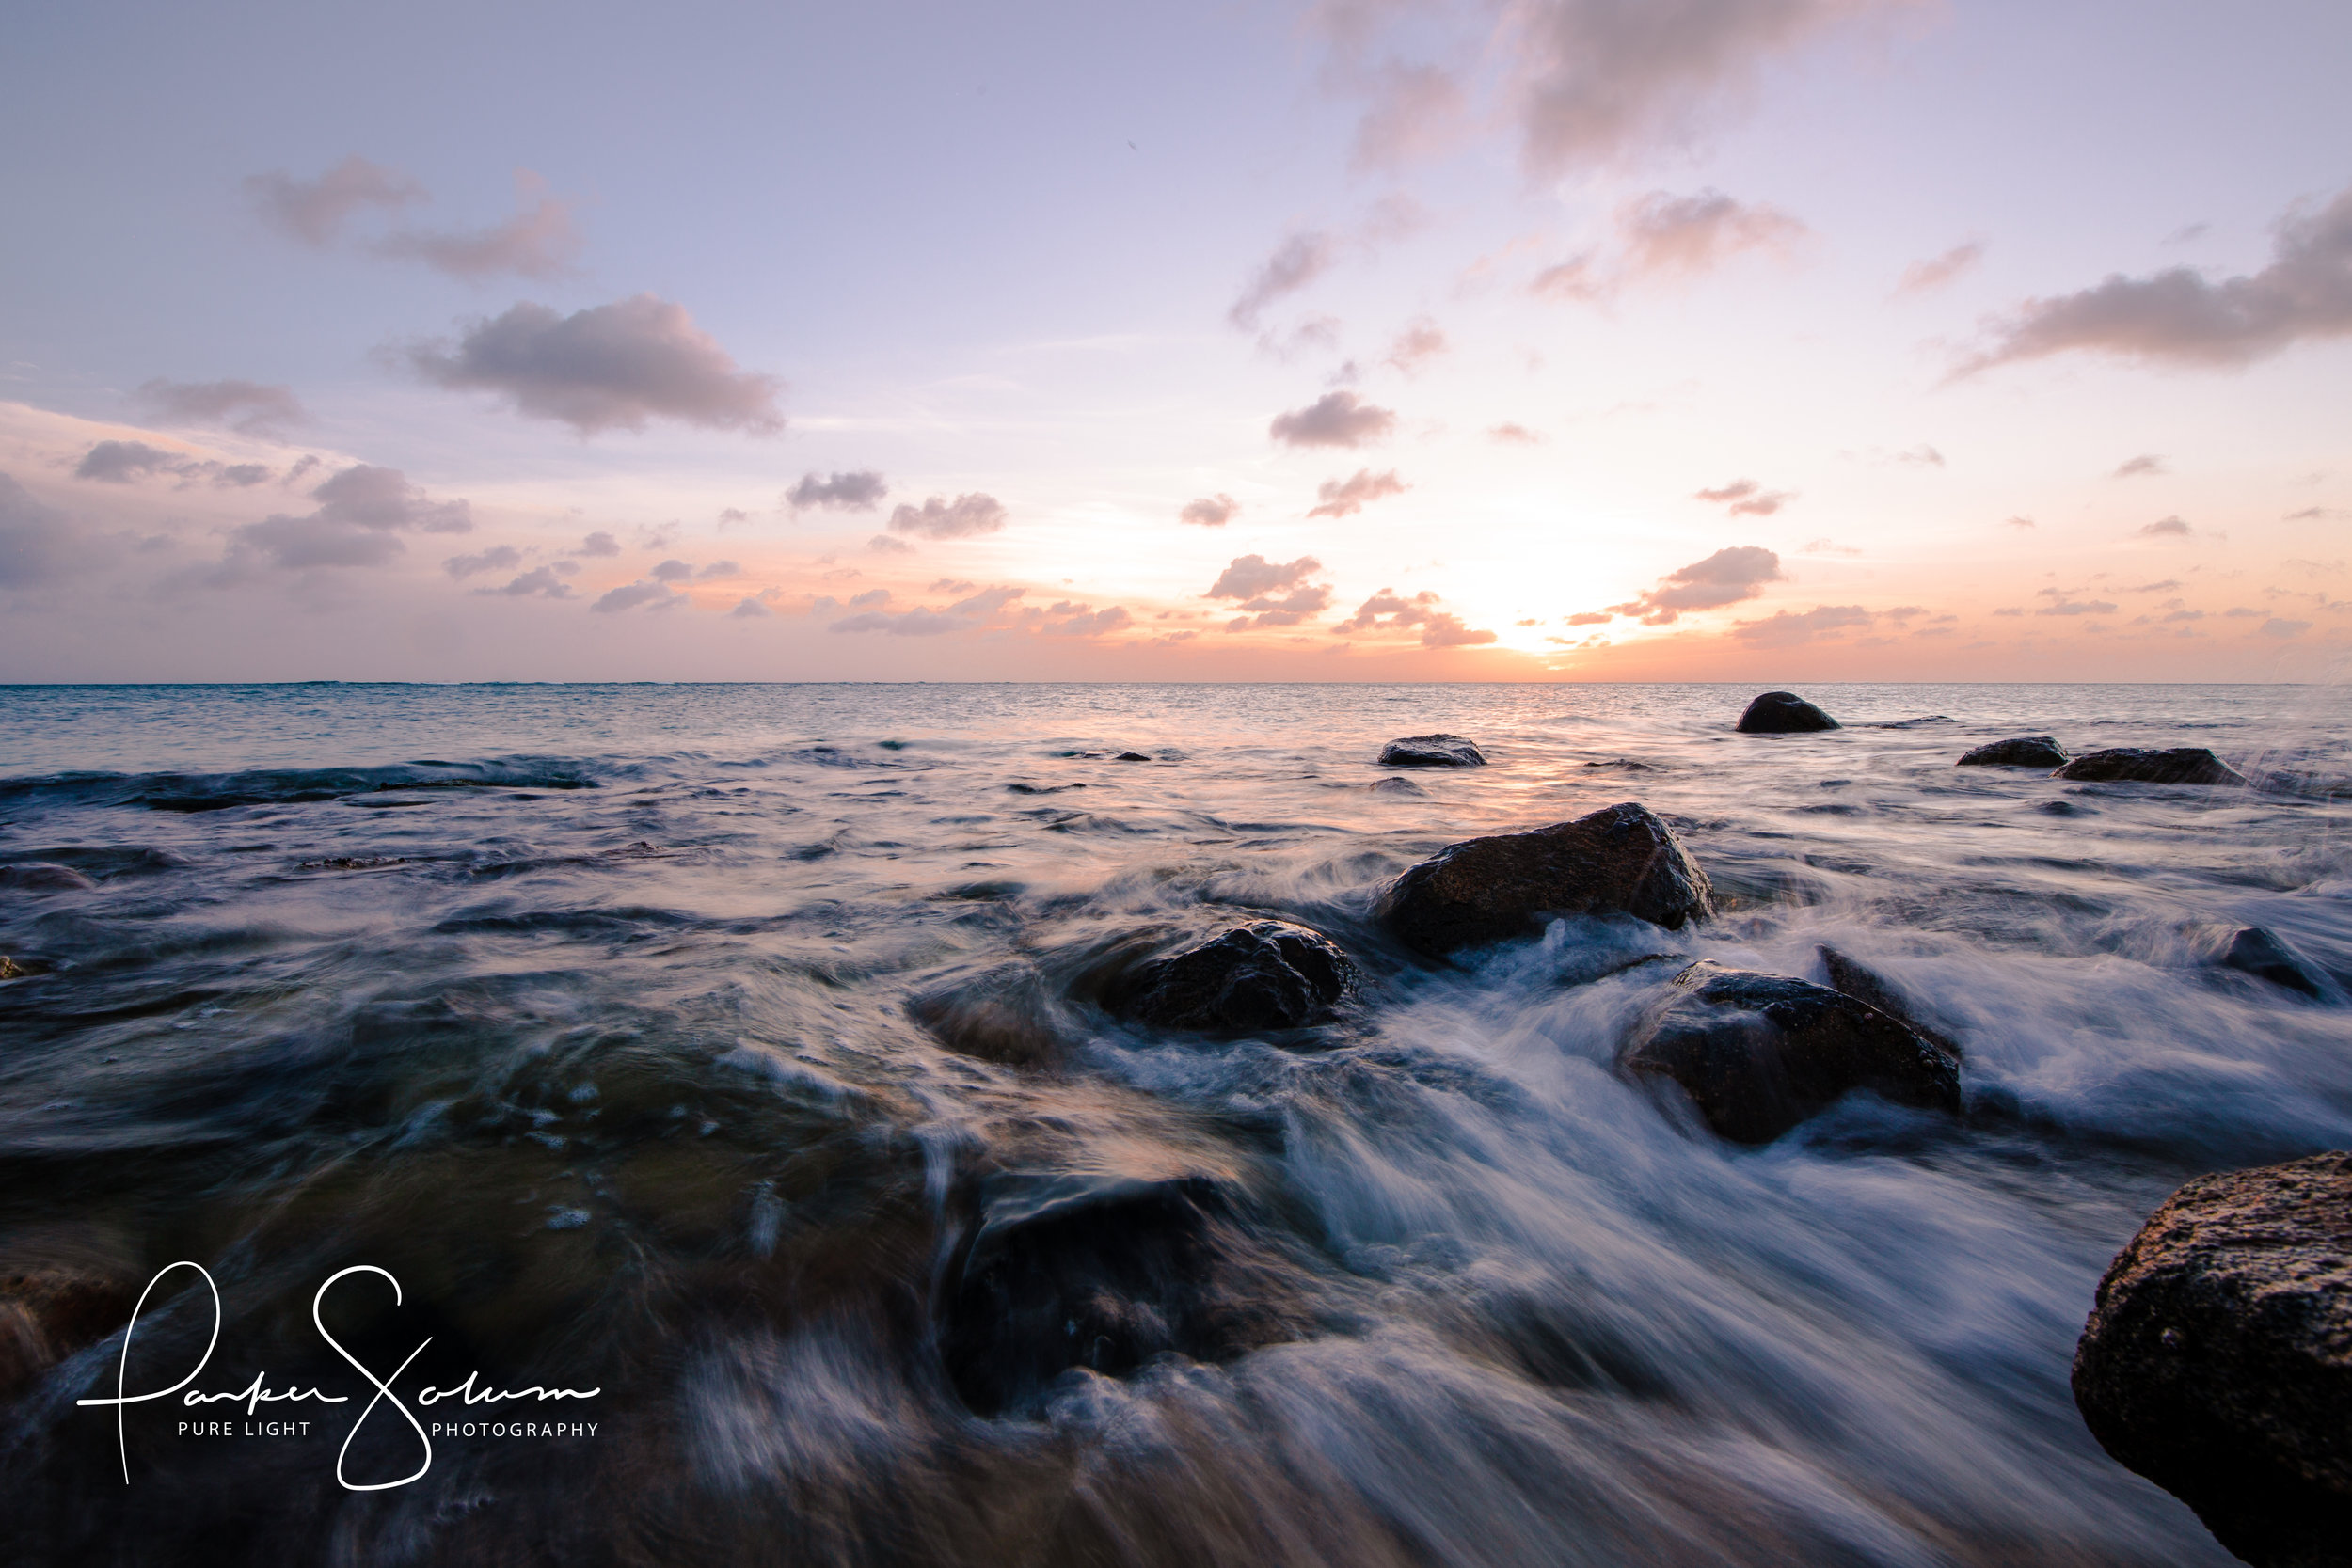 Aruba 2018 Sunset-1.jpg